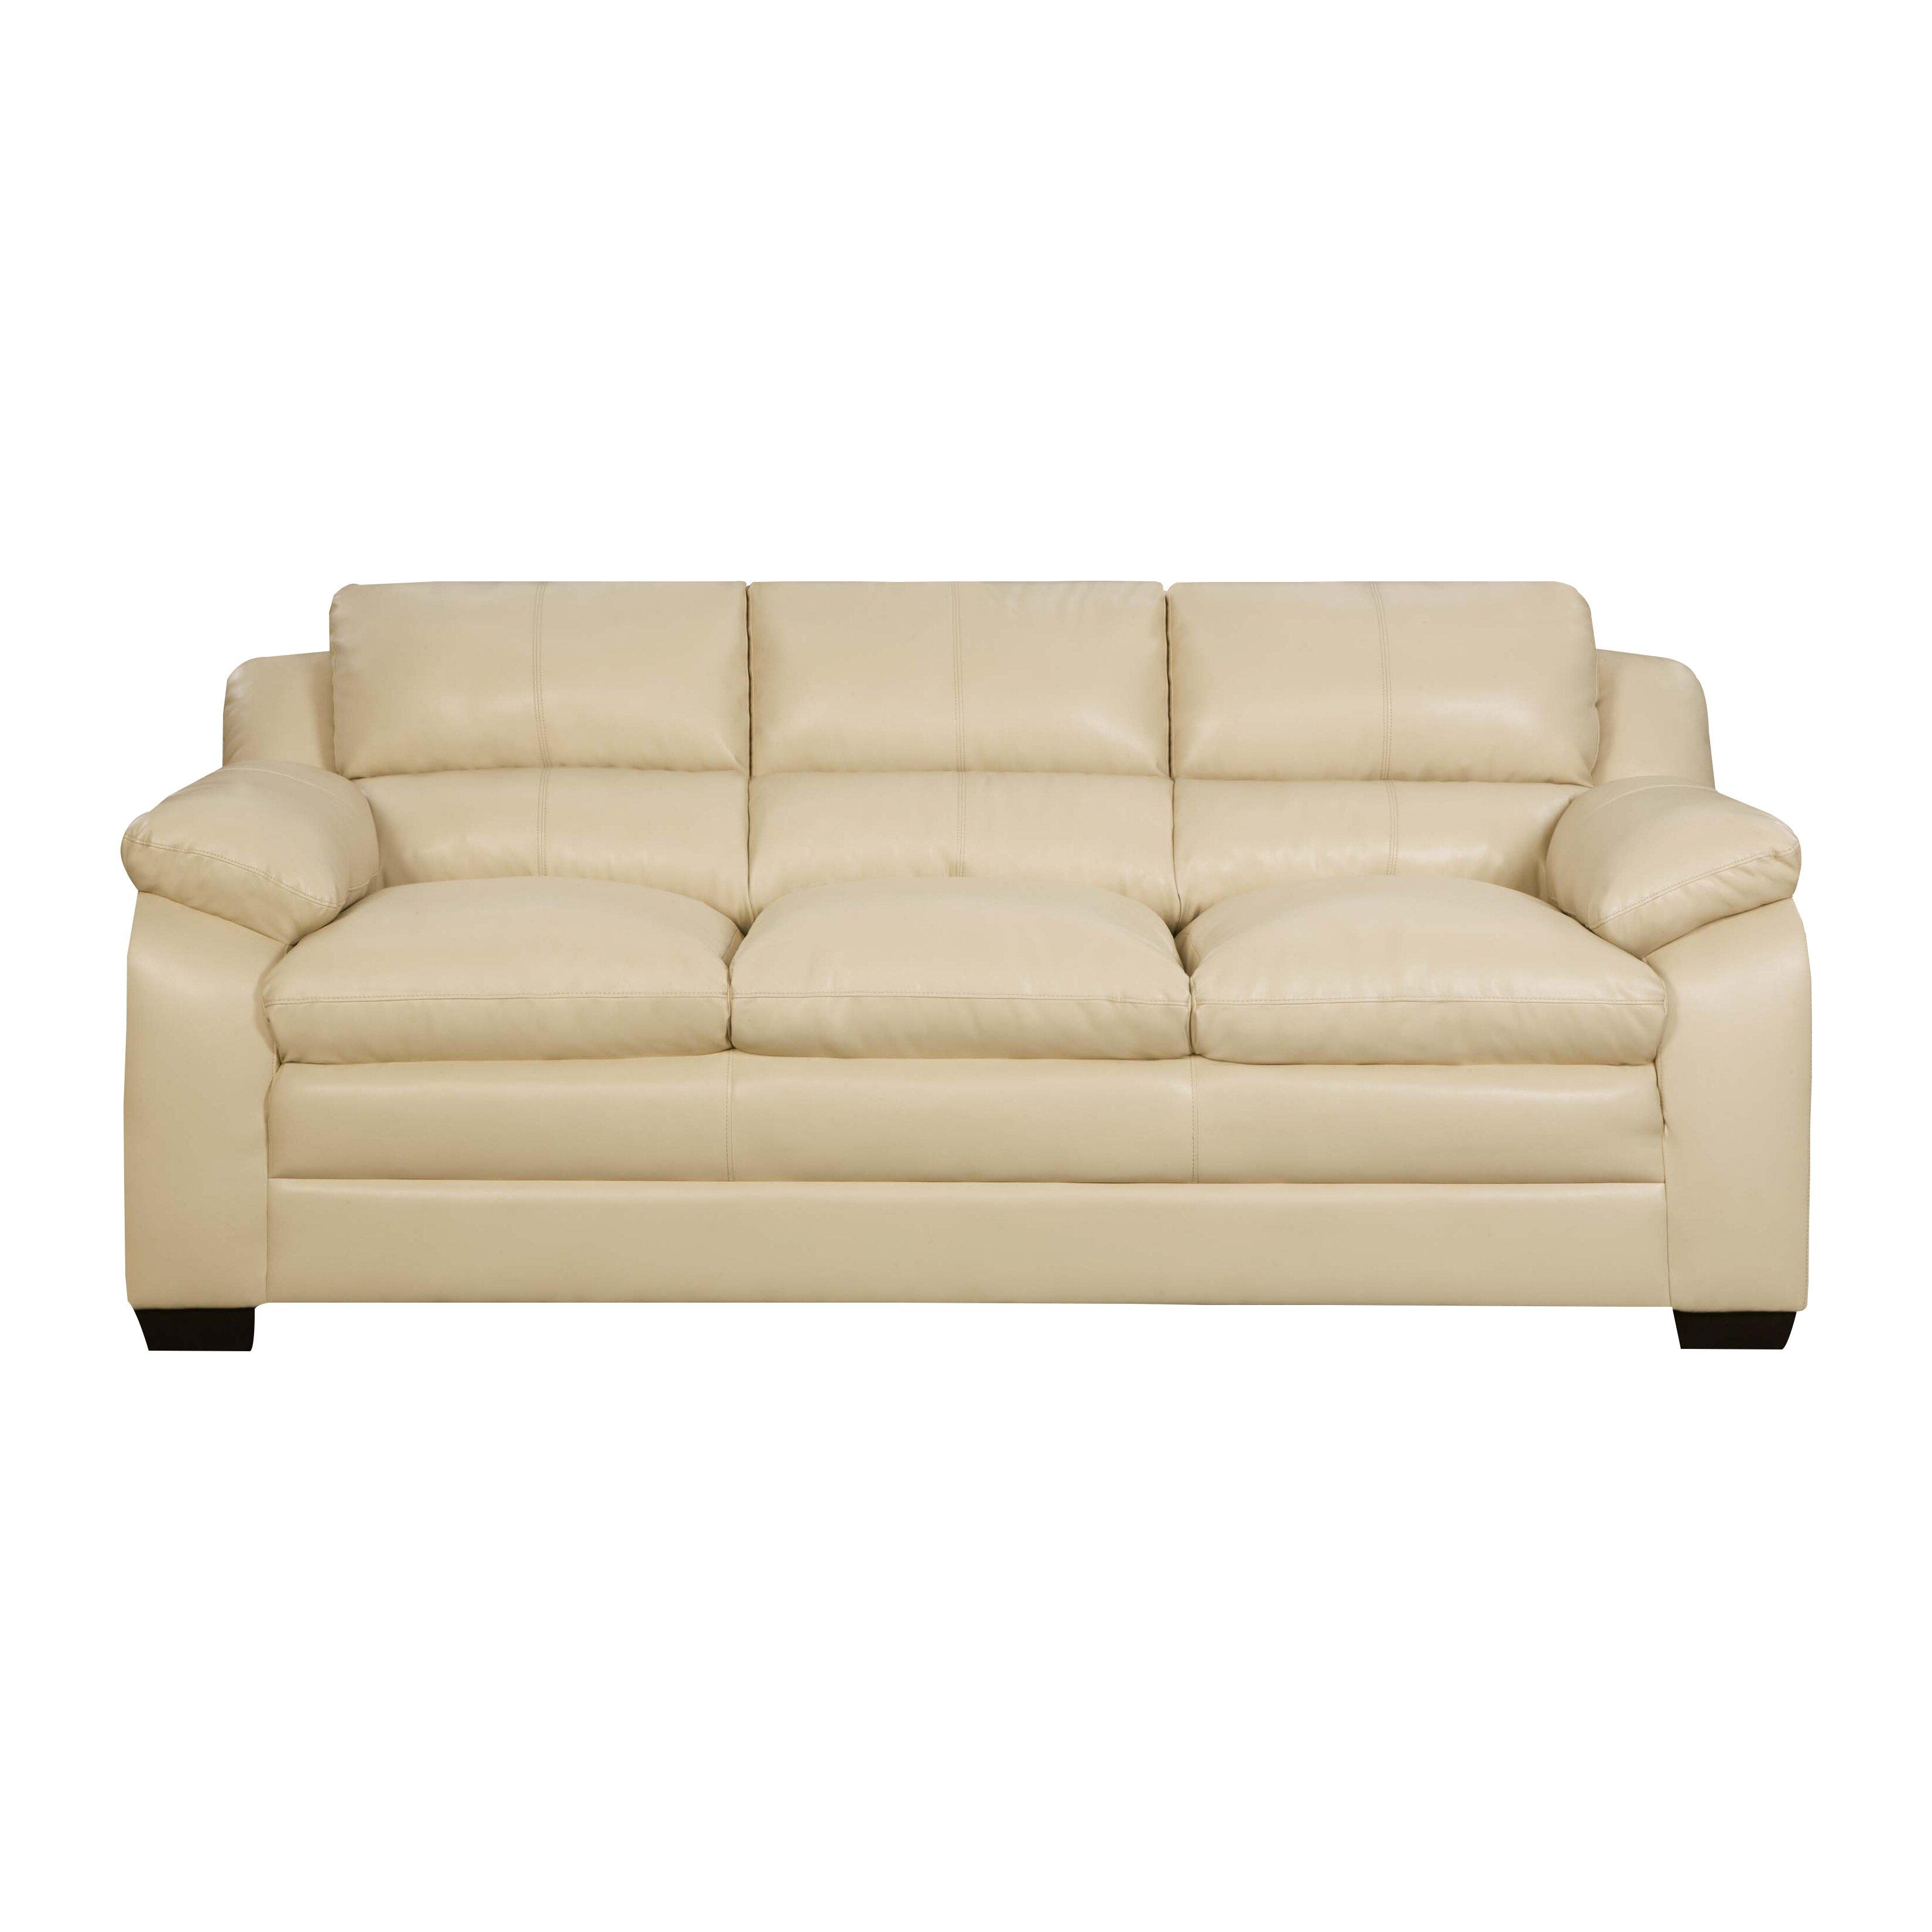 Simmons upholstery soho sofa reviews wayfair for Simmons sofa bed reviews